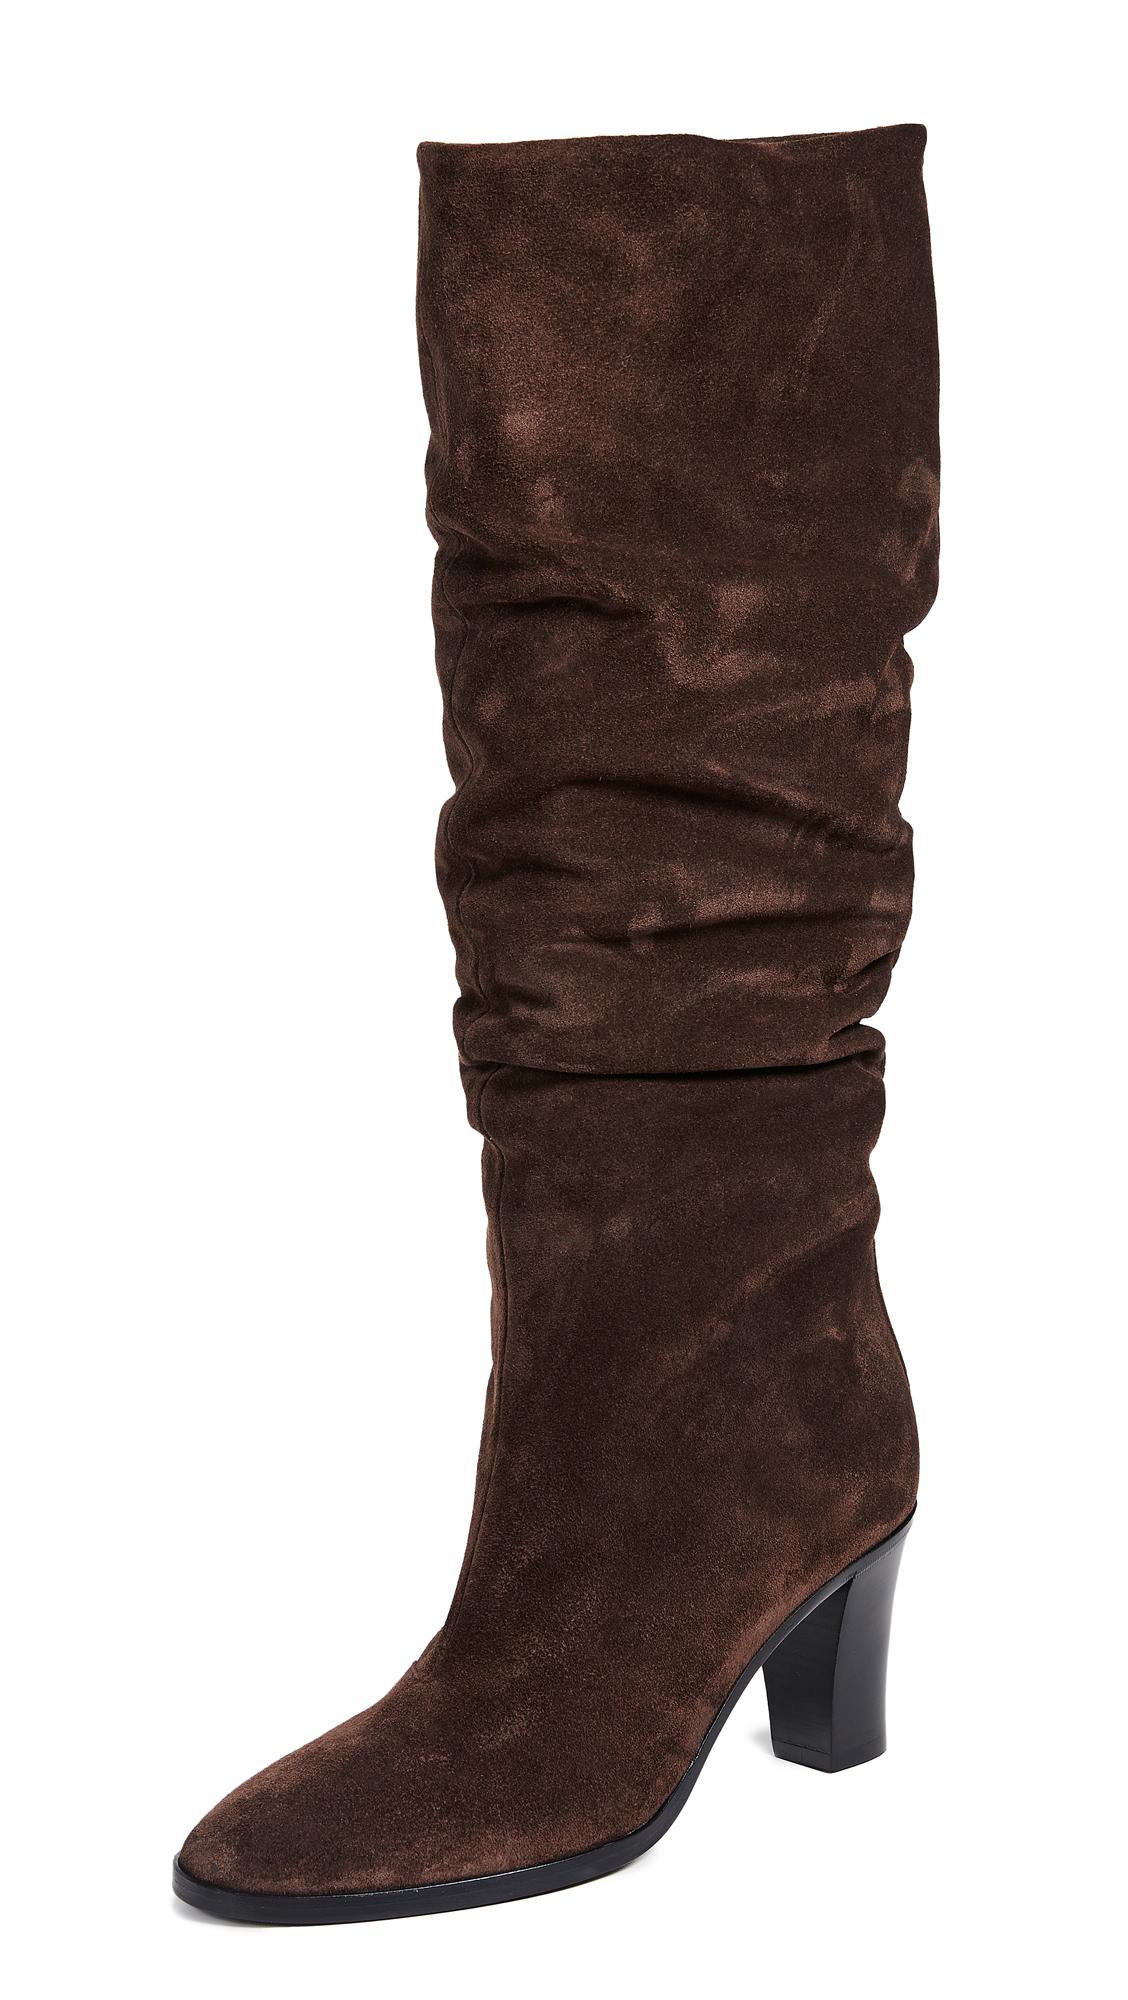 Vince Casper Boots - Cotto